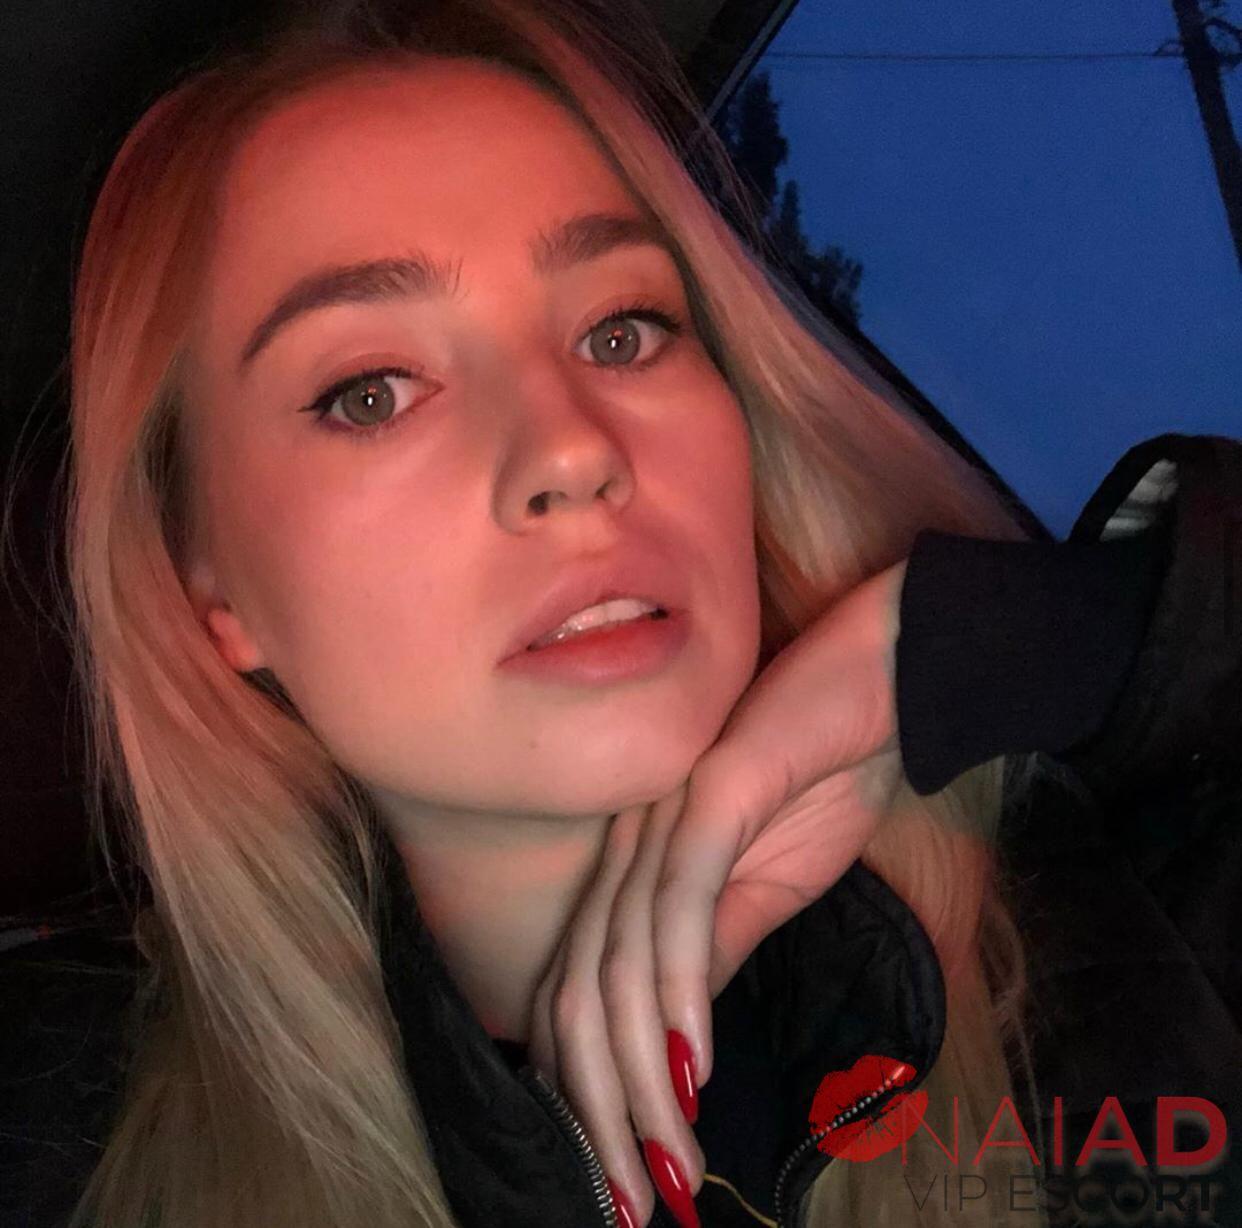 Photo of Arabella_naiad on Naiad vip escort service in Paris